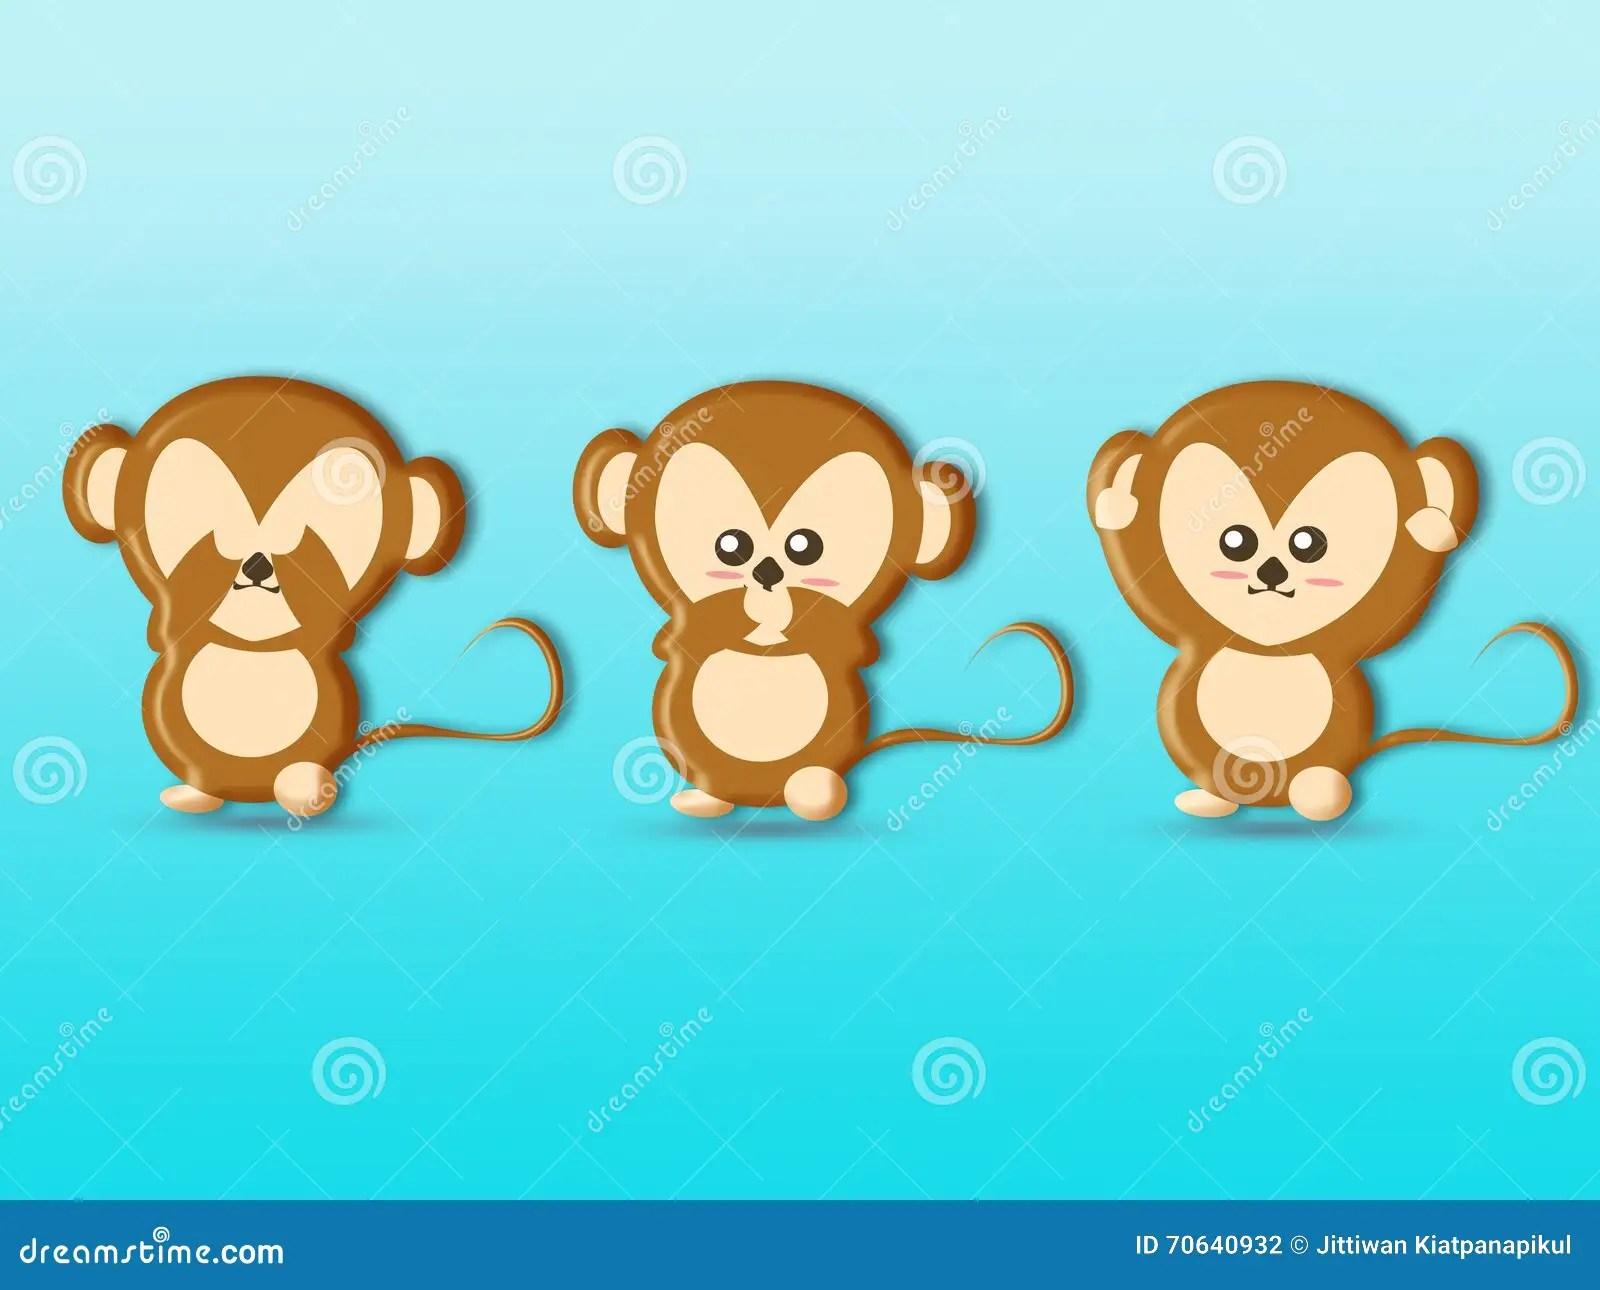 Cute Three Wise Monkeys Cartoons Background Royalty Free